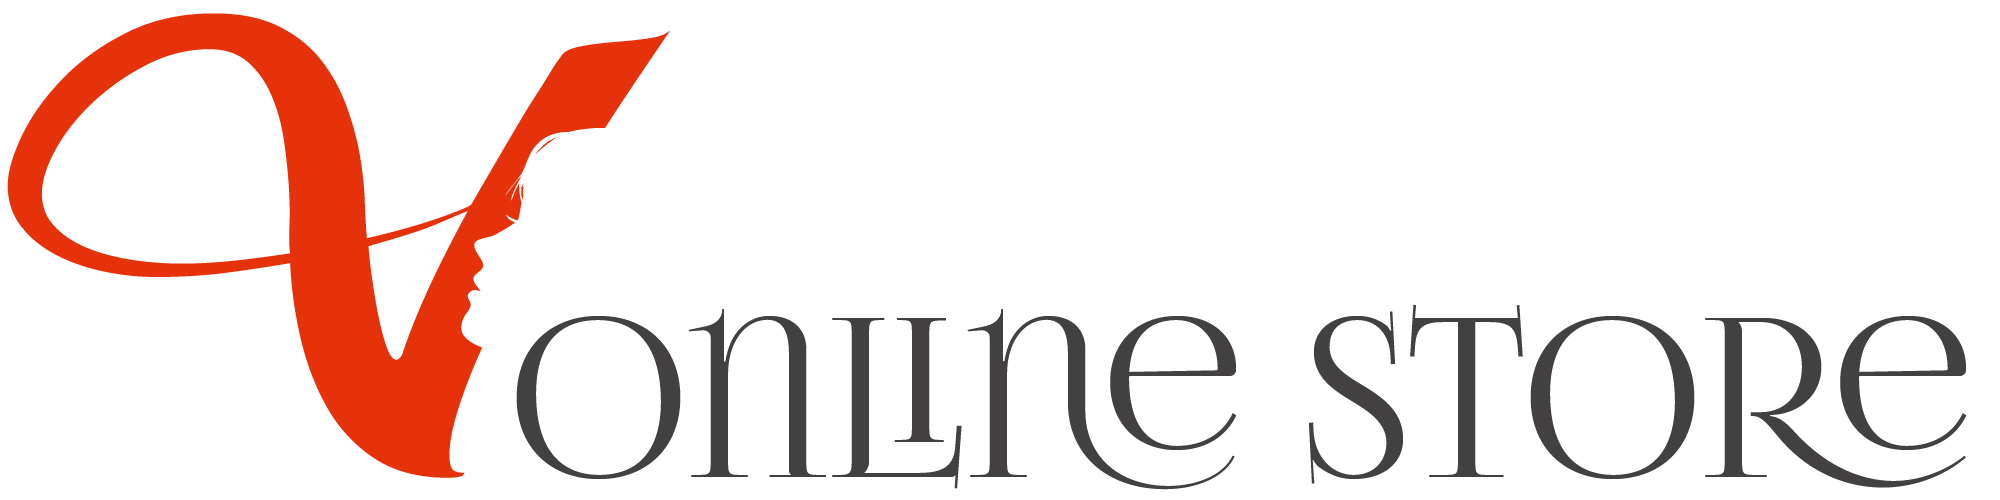 Visage Cosmetic e.U. Online Shop